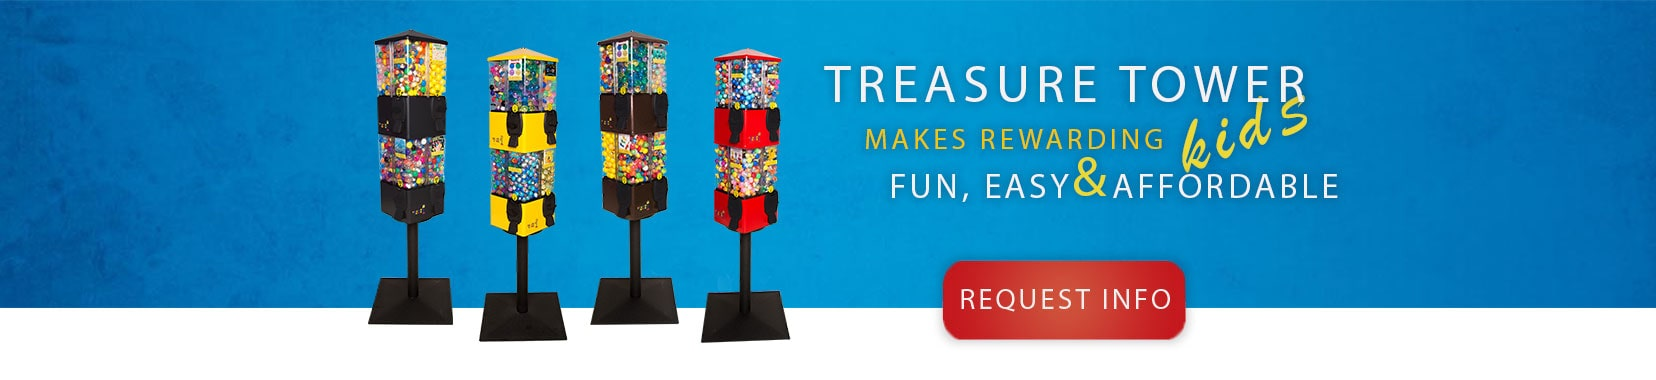 Treasure Tower makes rewarding kids, fun, easy and affordable.